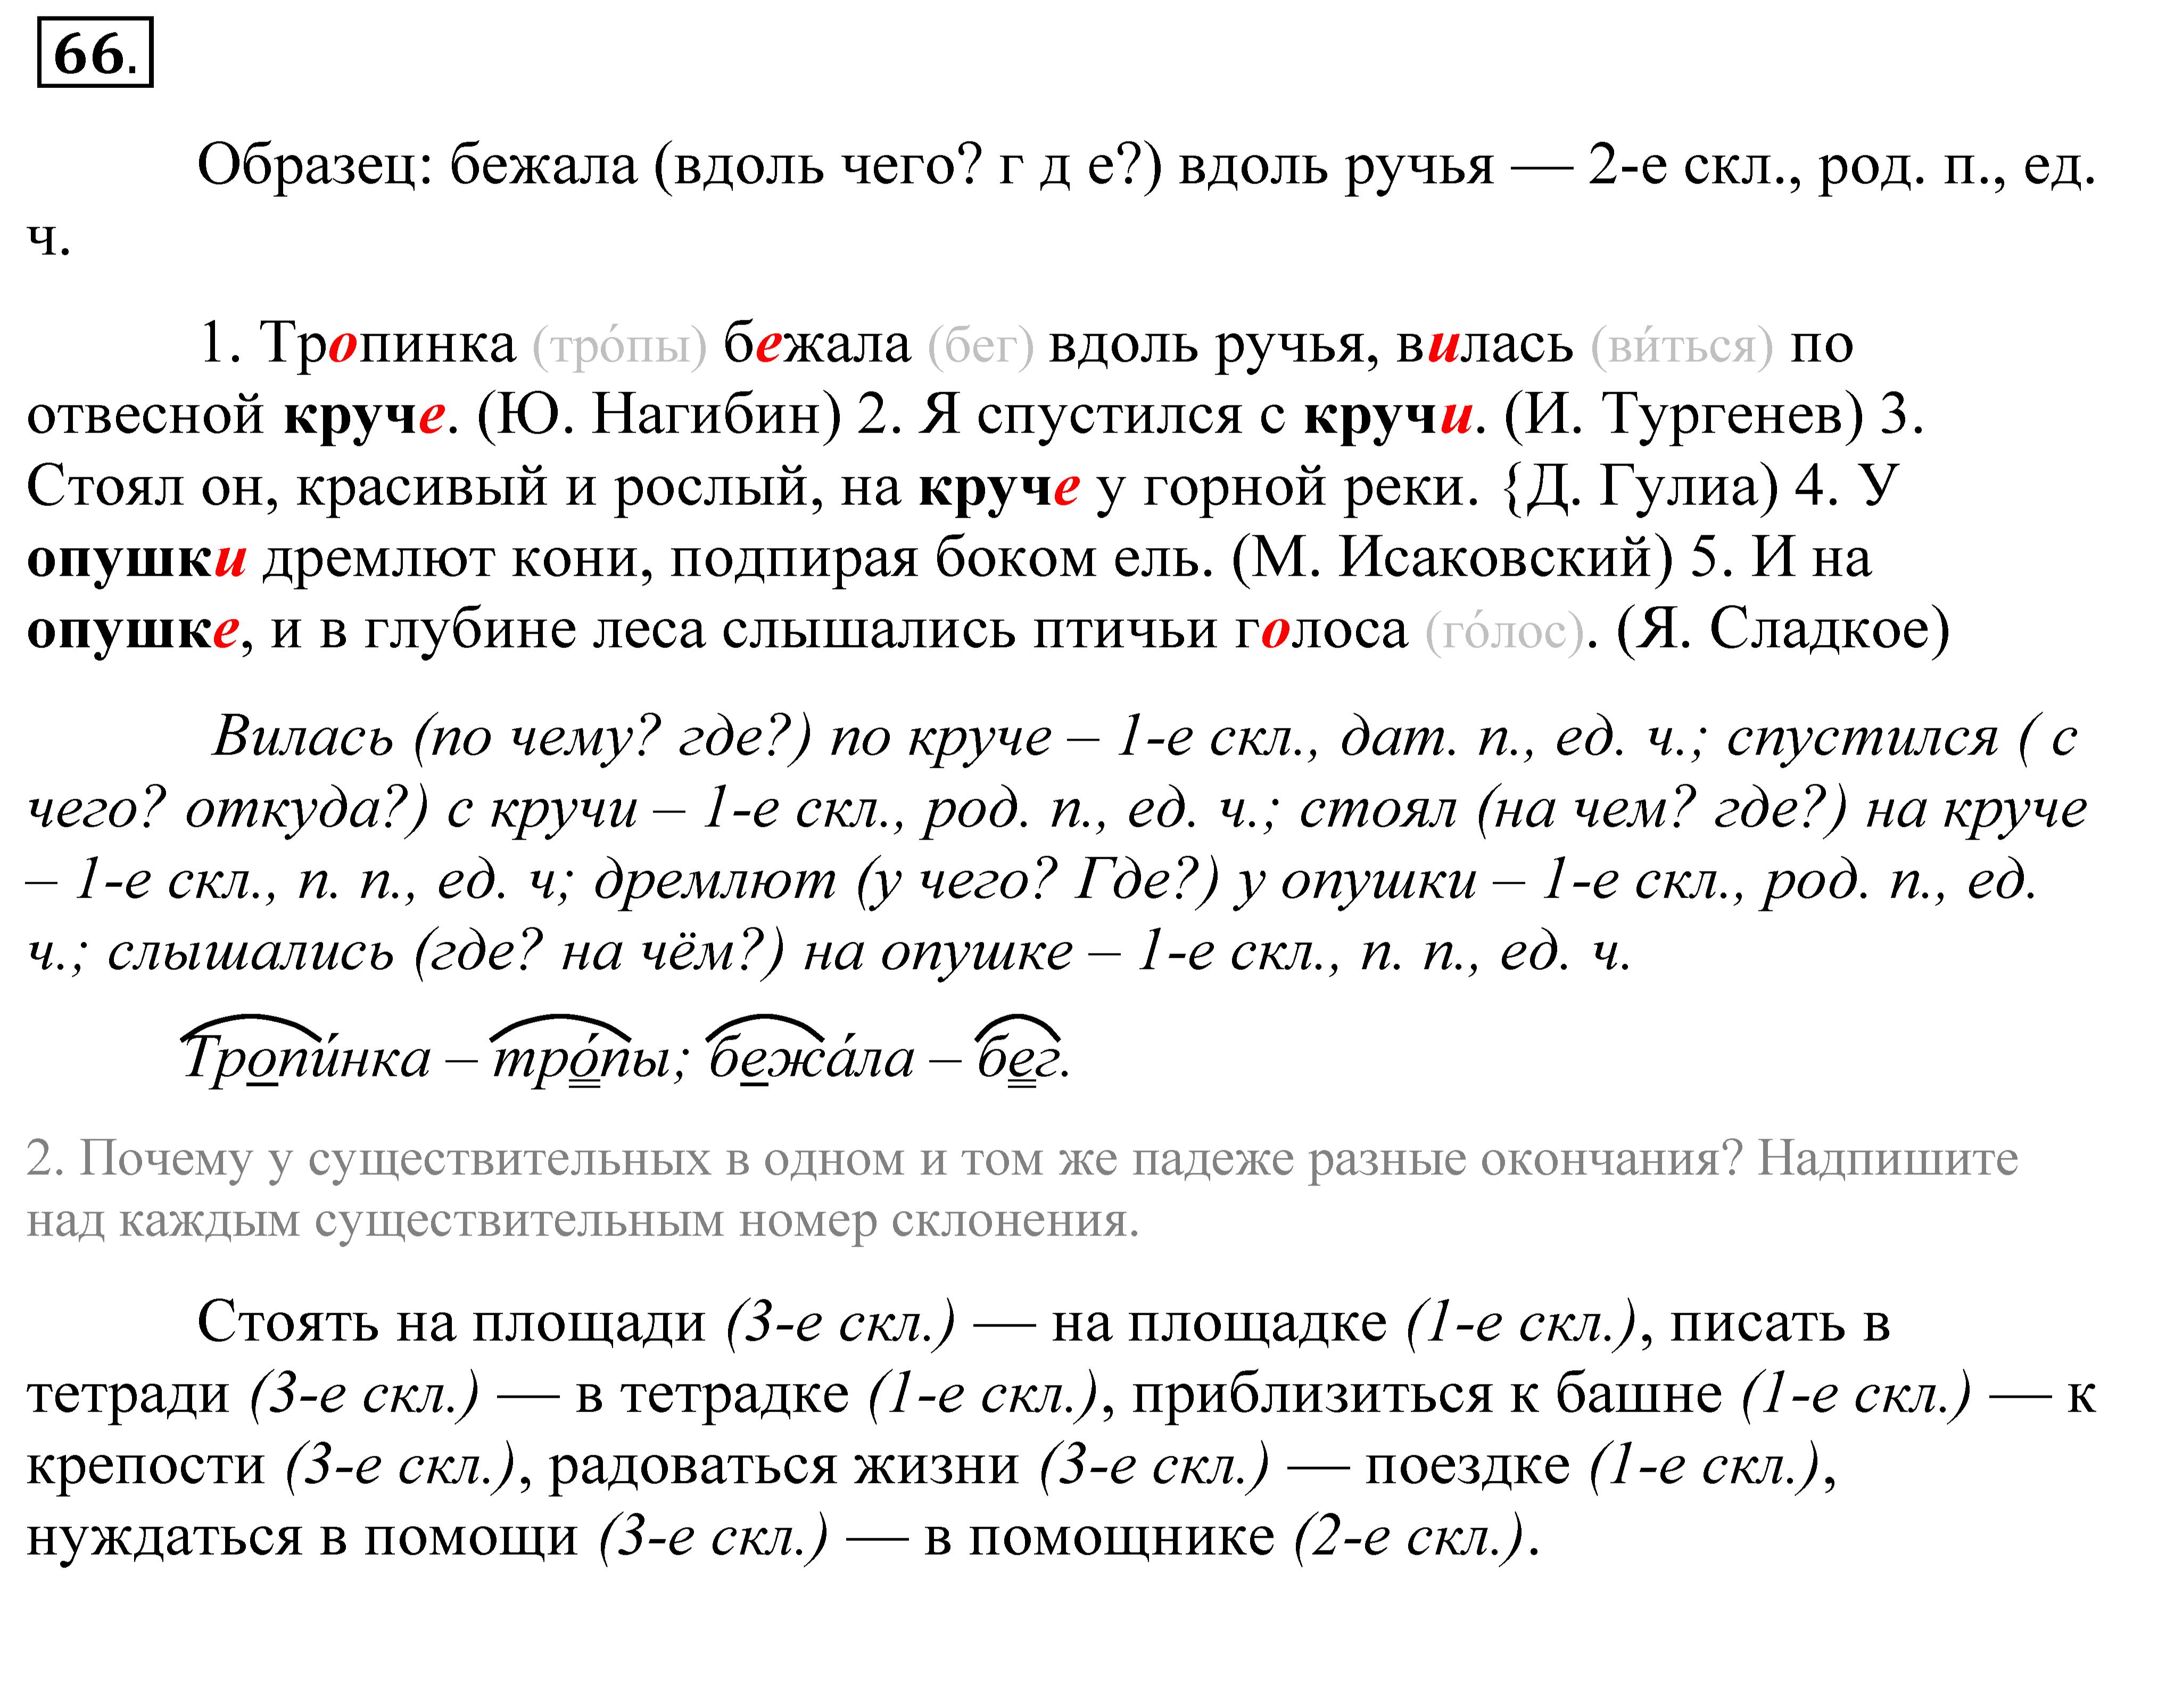 Решебник русский язык 5 класс купалова и еремеева и пахнова